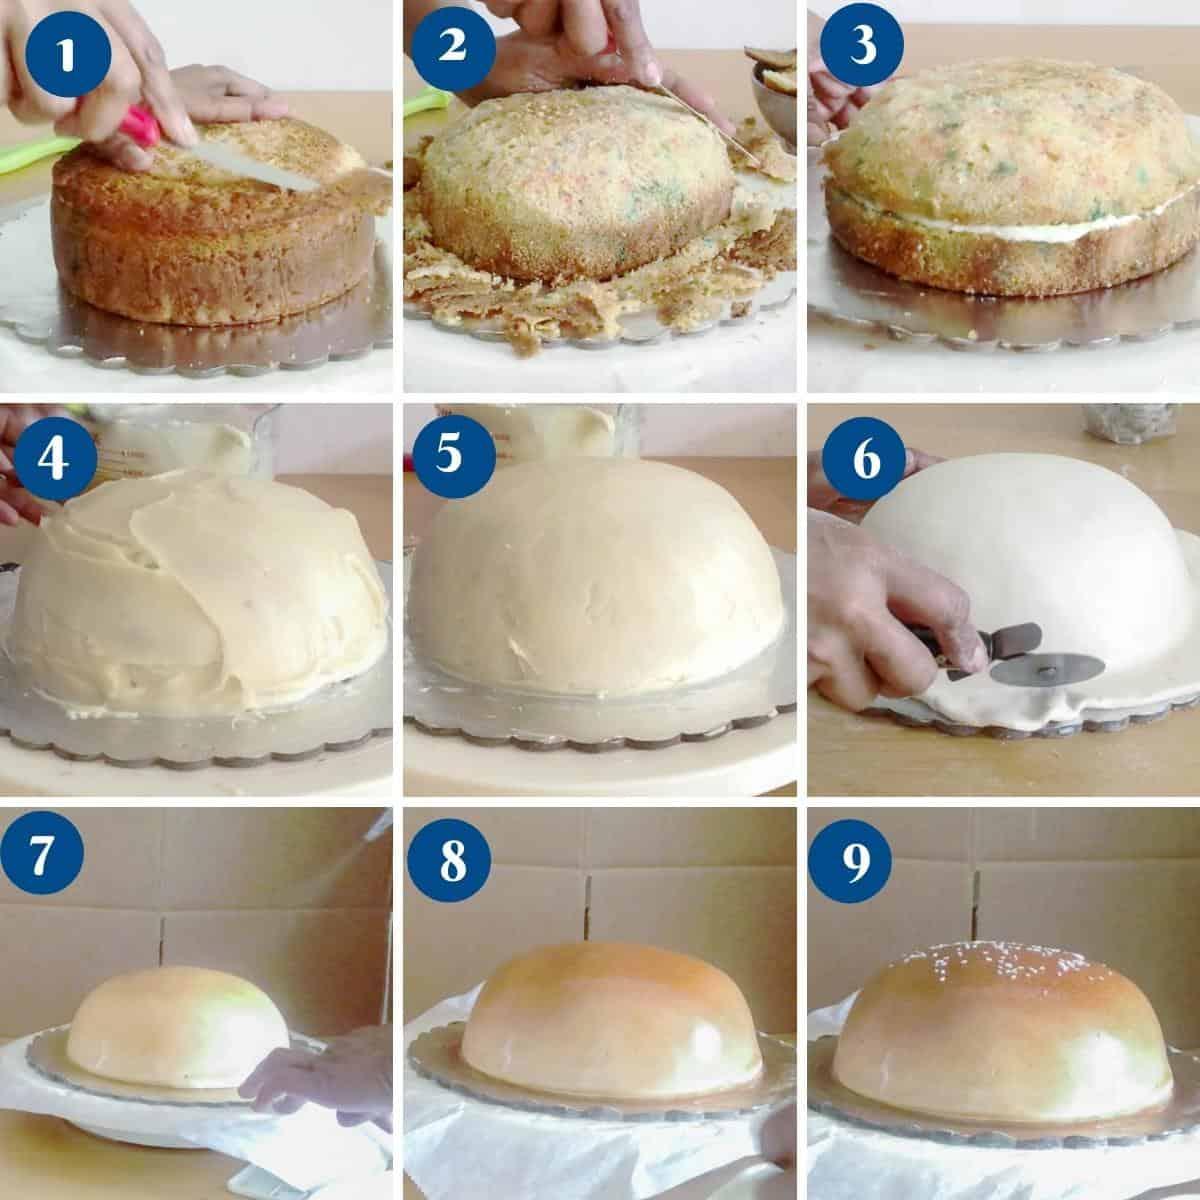 Progress pictures making the hamburger bun top for the burger cake